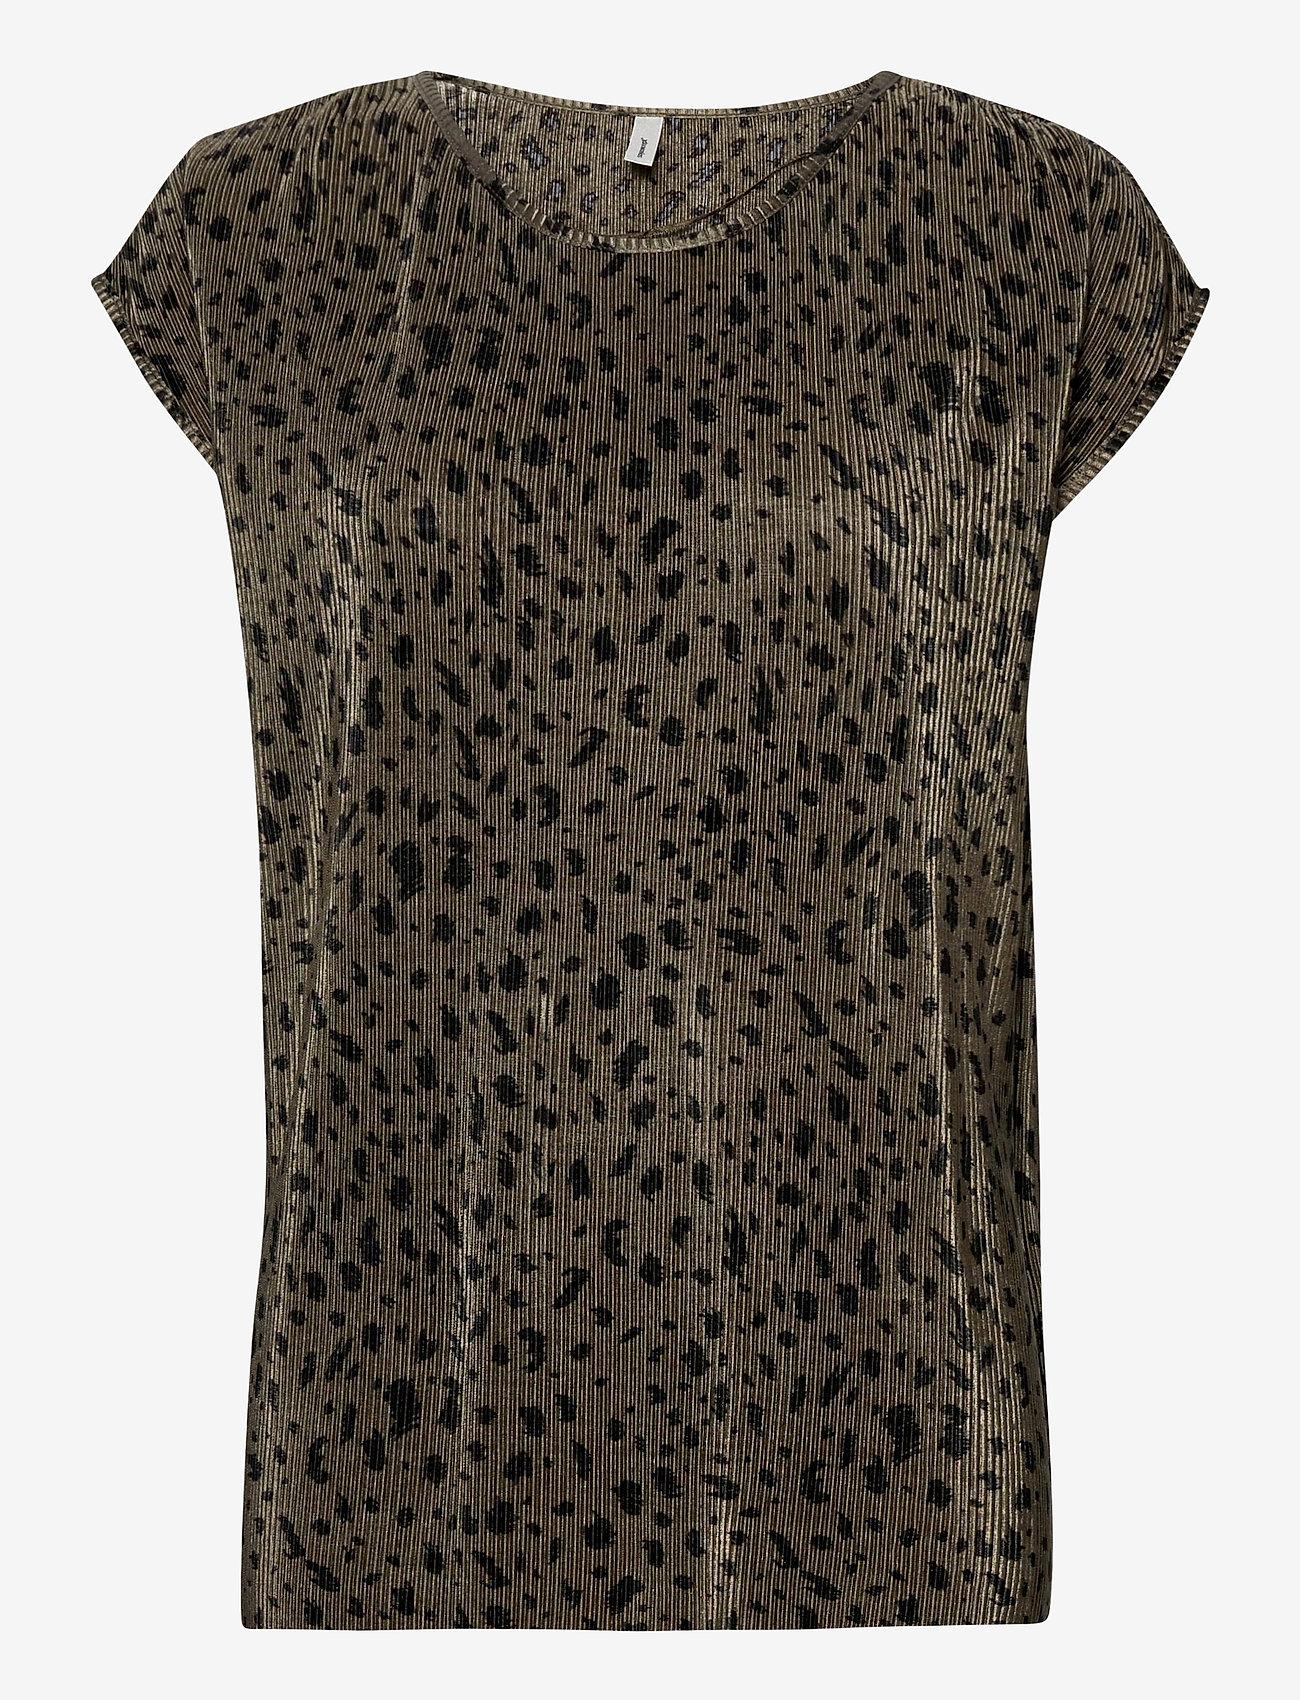 Soyaconcept - SC-OLINDA - short-sleeved blouses - dark army combi - 0